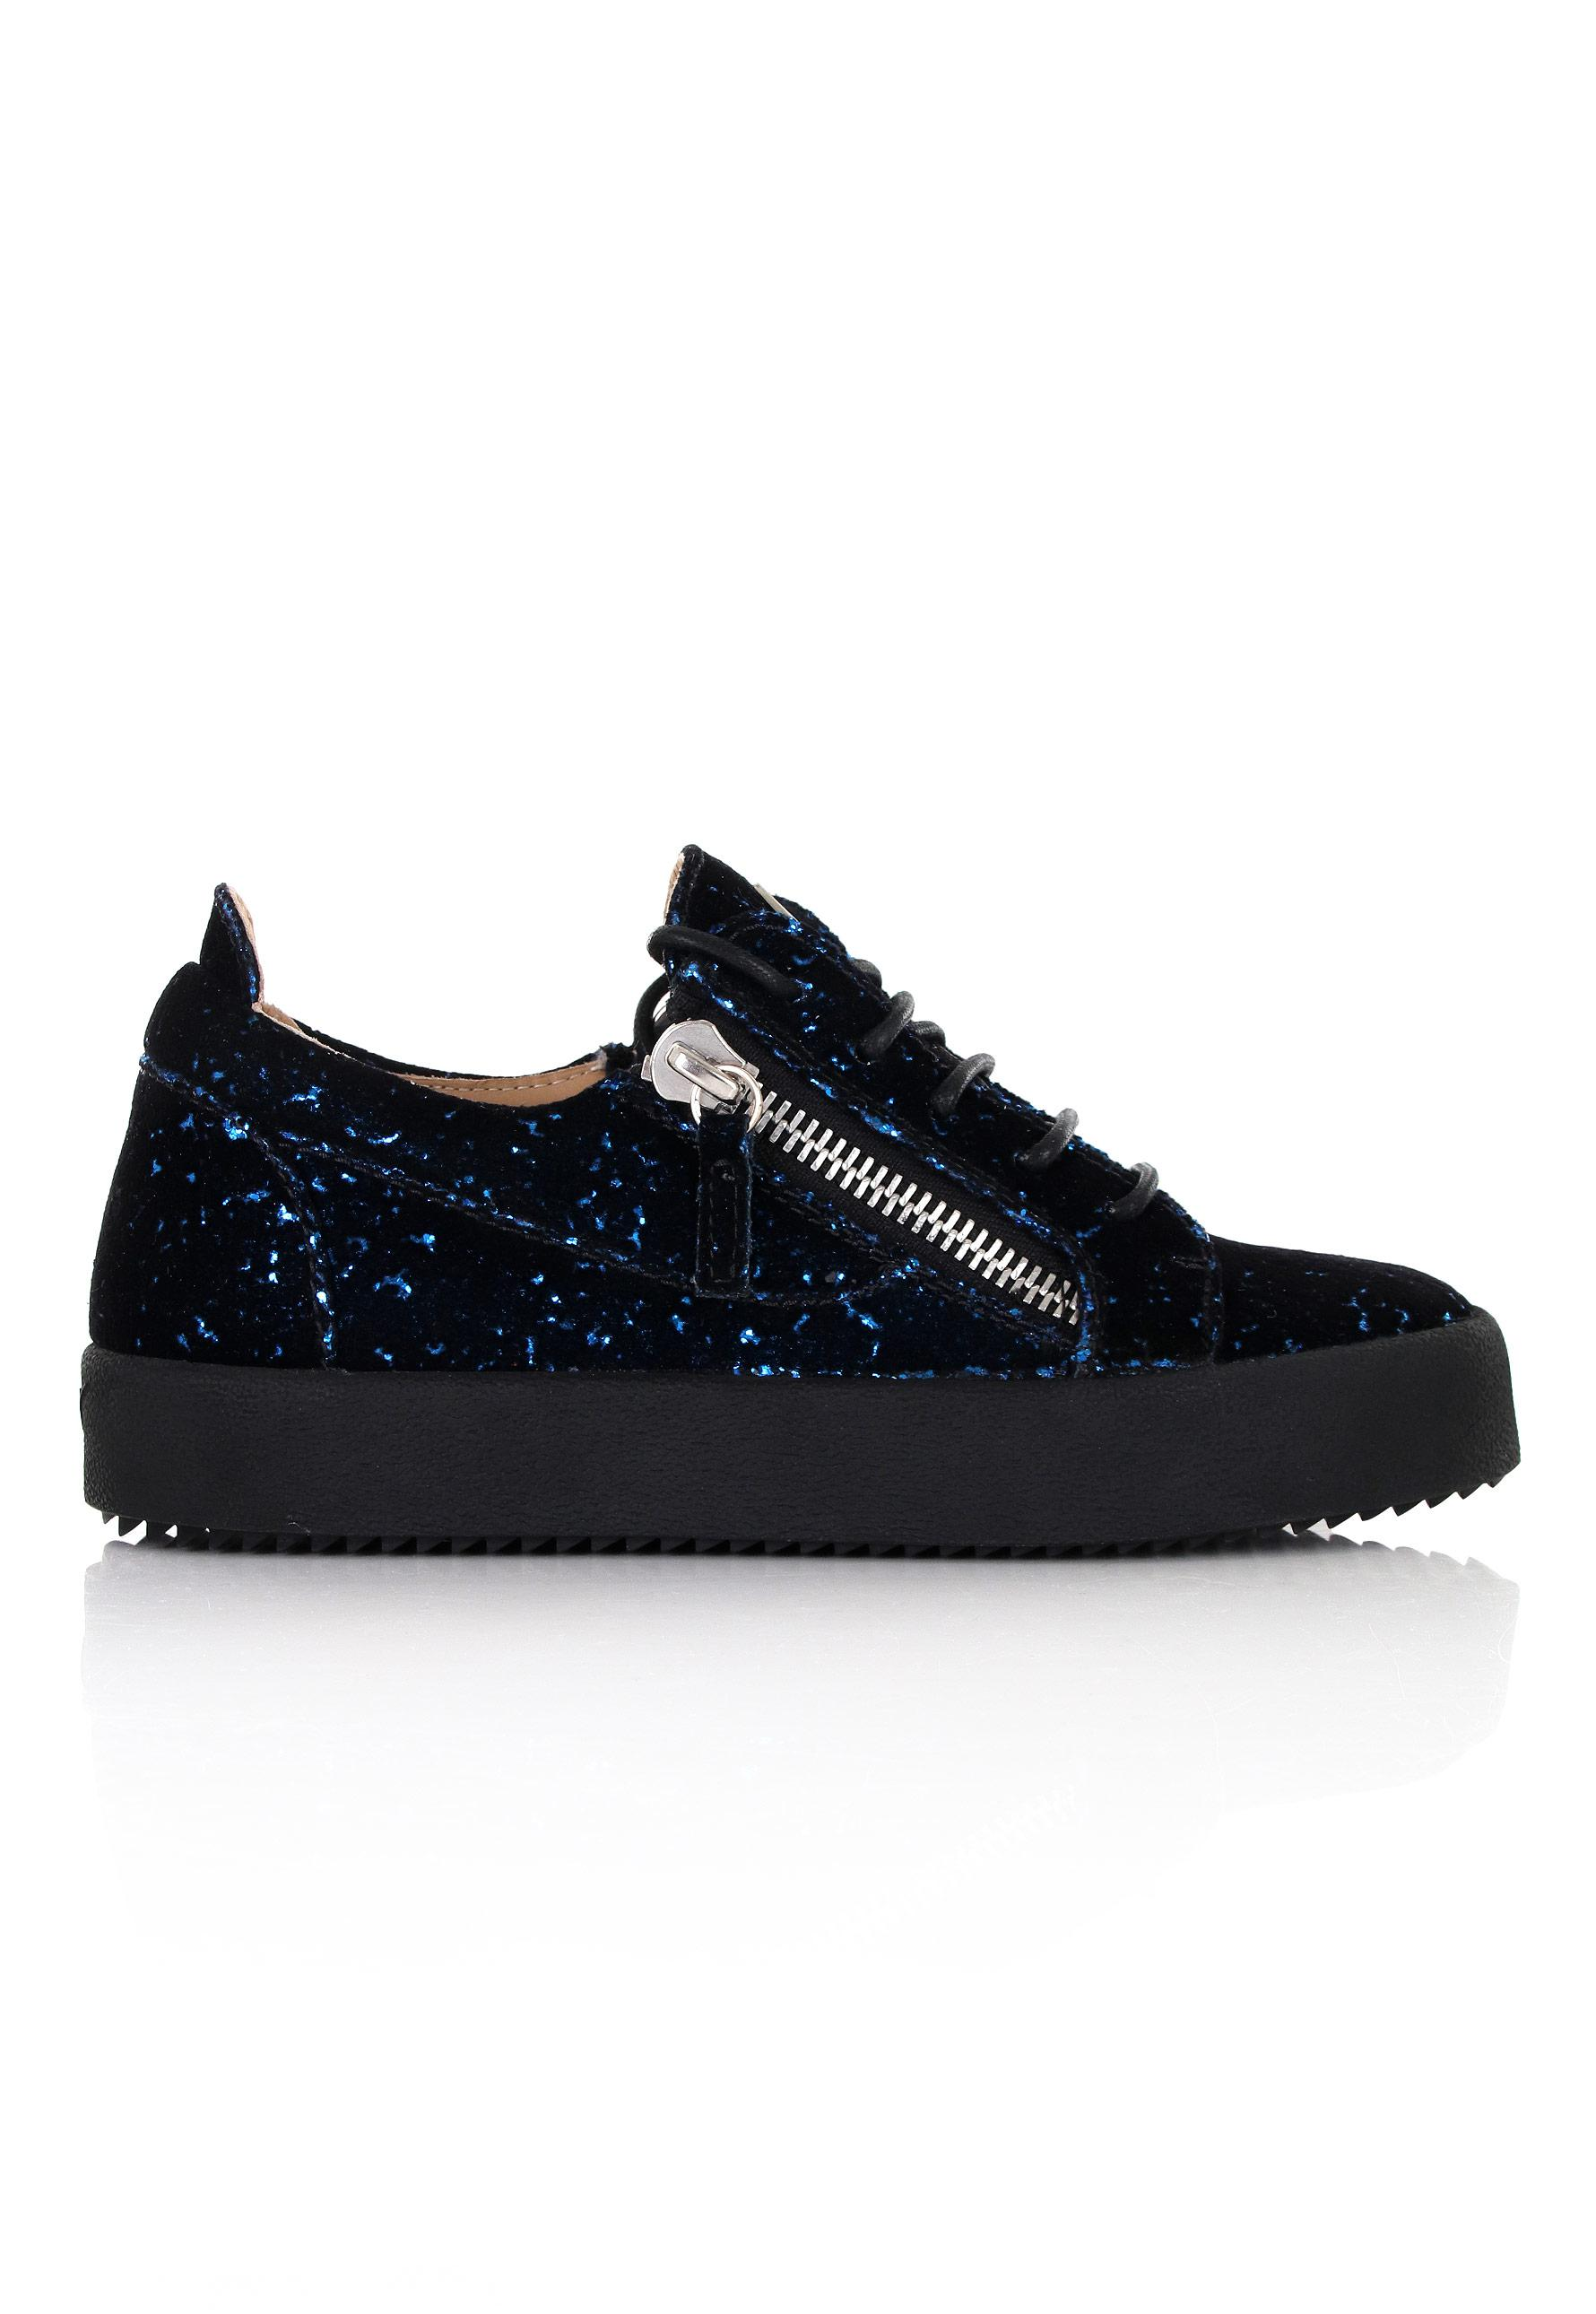 0fc2170a7b88 Giuseppe Zanotti Gail Glitter Low-top Sneakers Black in Black for ...